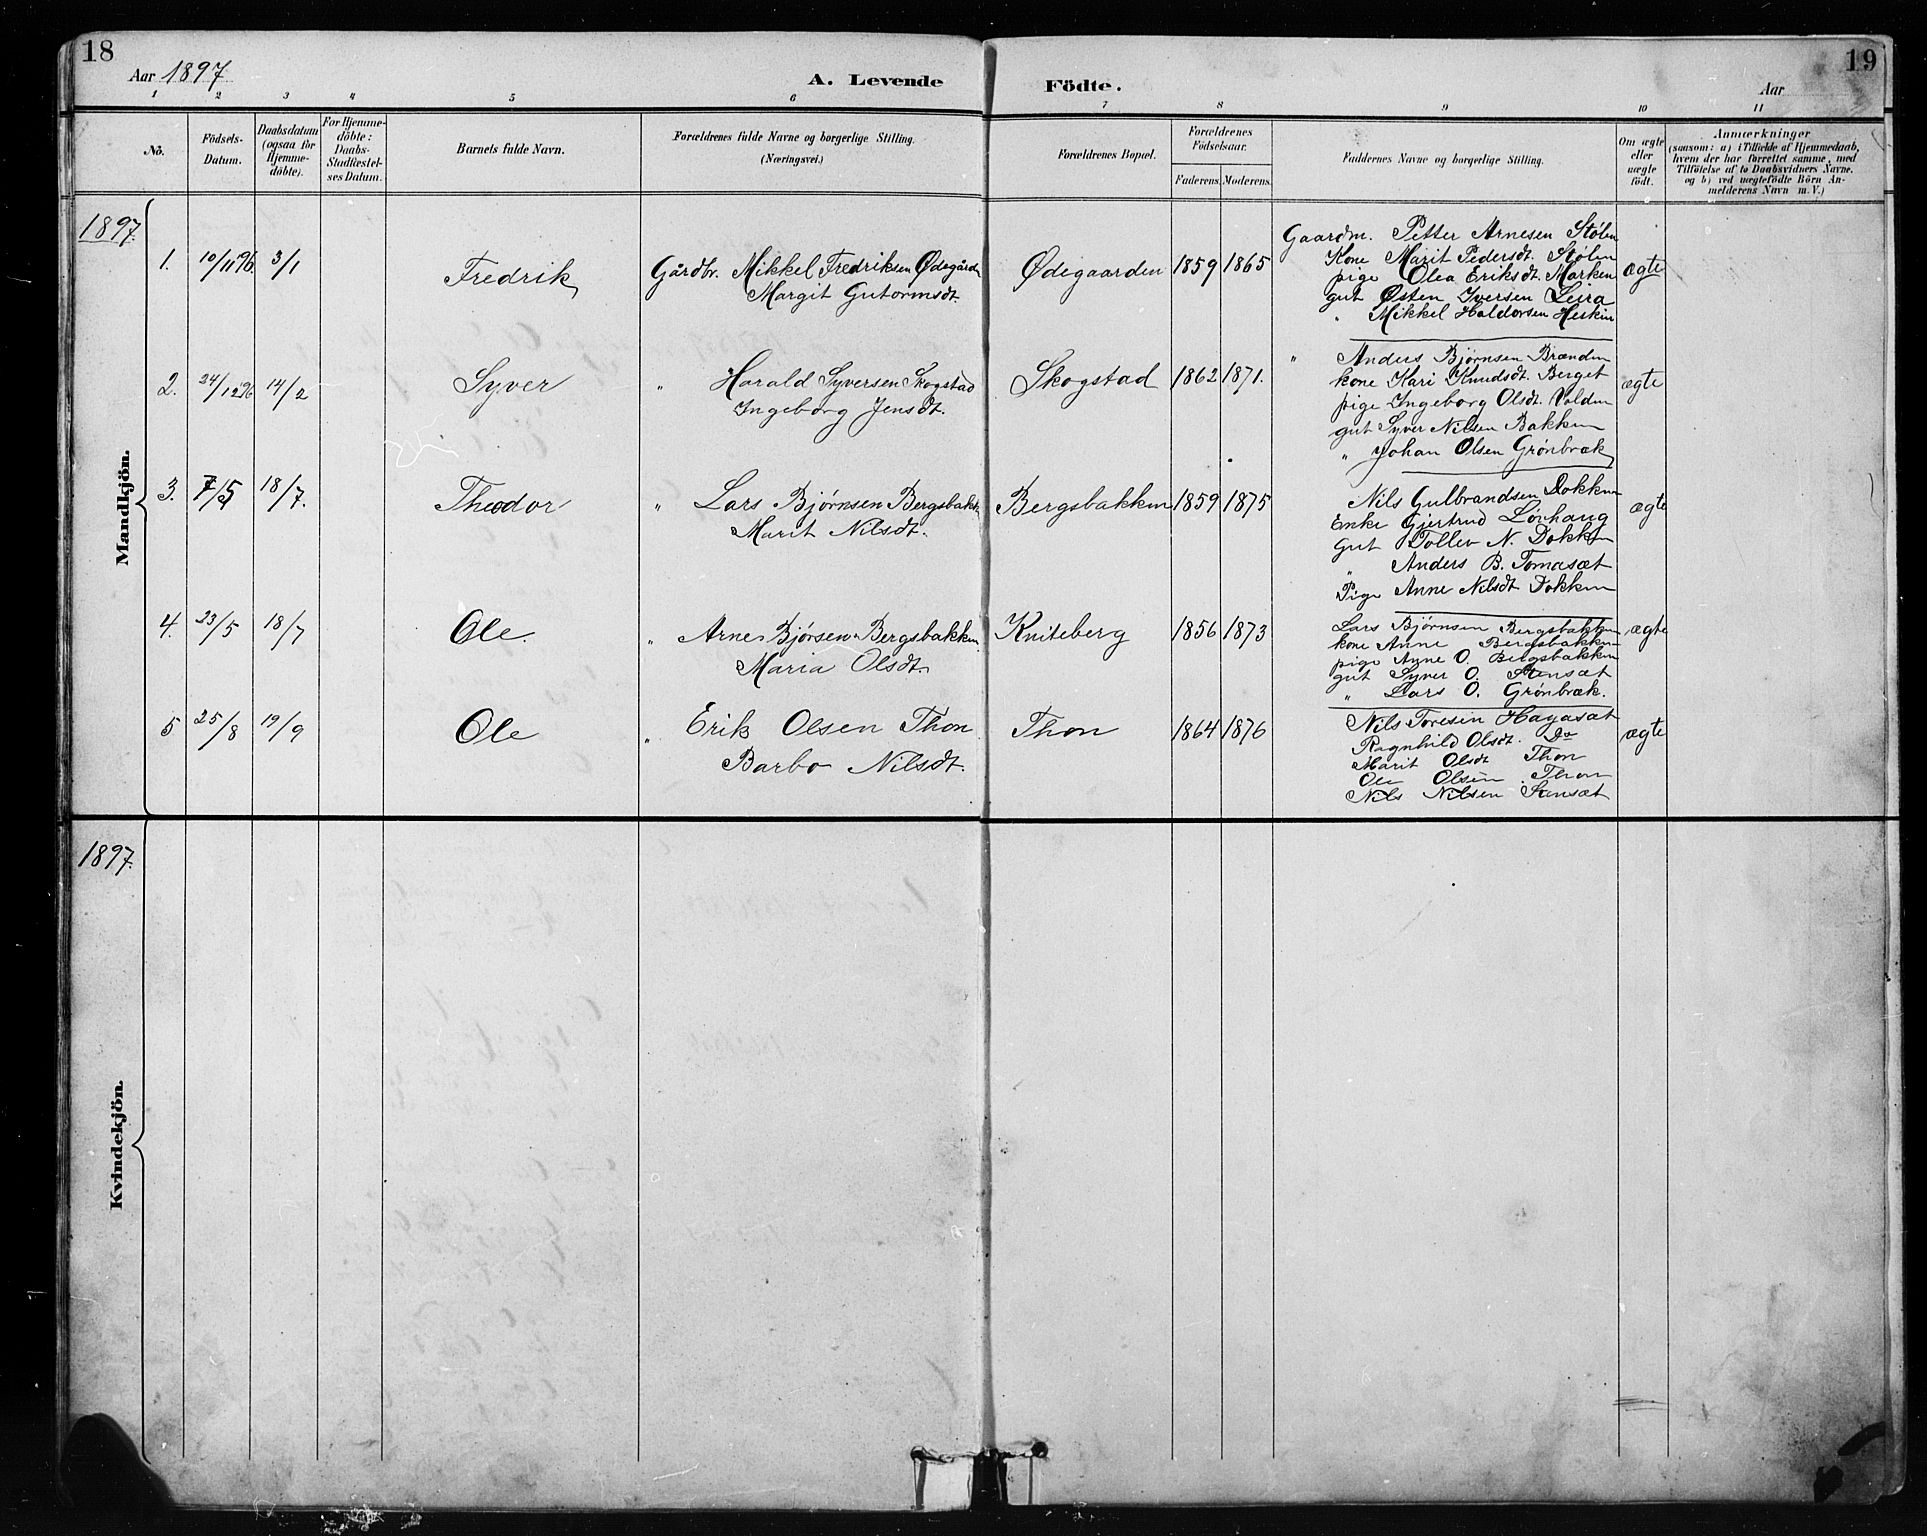 SAH, Etnedal prestekontor, H/Ha/Hab/Habb/L0001: Klokkerbok nr. II 1, 1894-1911, s. 18-19